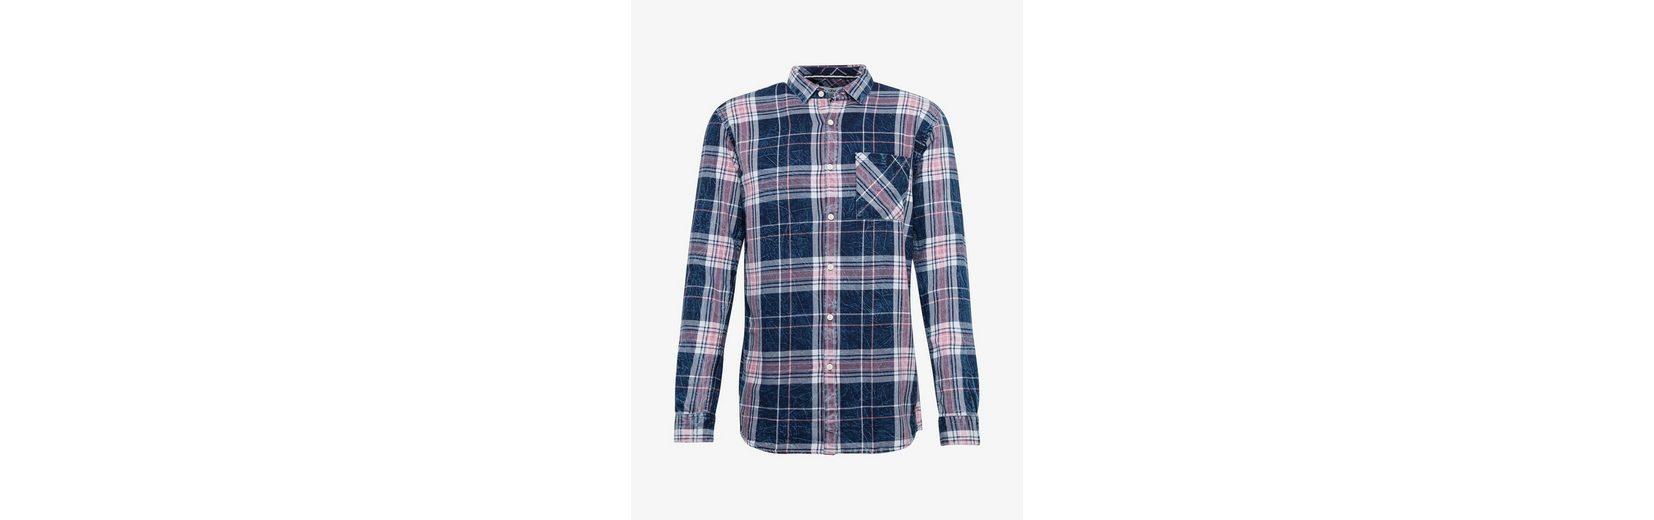 Rabatt Nicekicks Tom Tailor Denim Hemd gemustertes Hemd Auslass Amazon Klassisch Angebote Günstig Online Niedriger Preis Zu Verkaufen ImYe0Ad